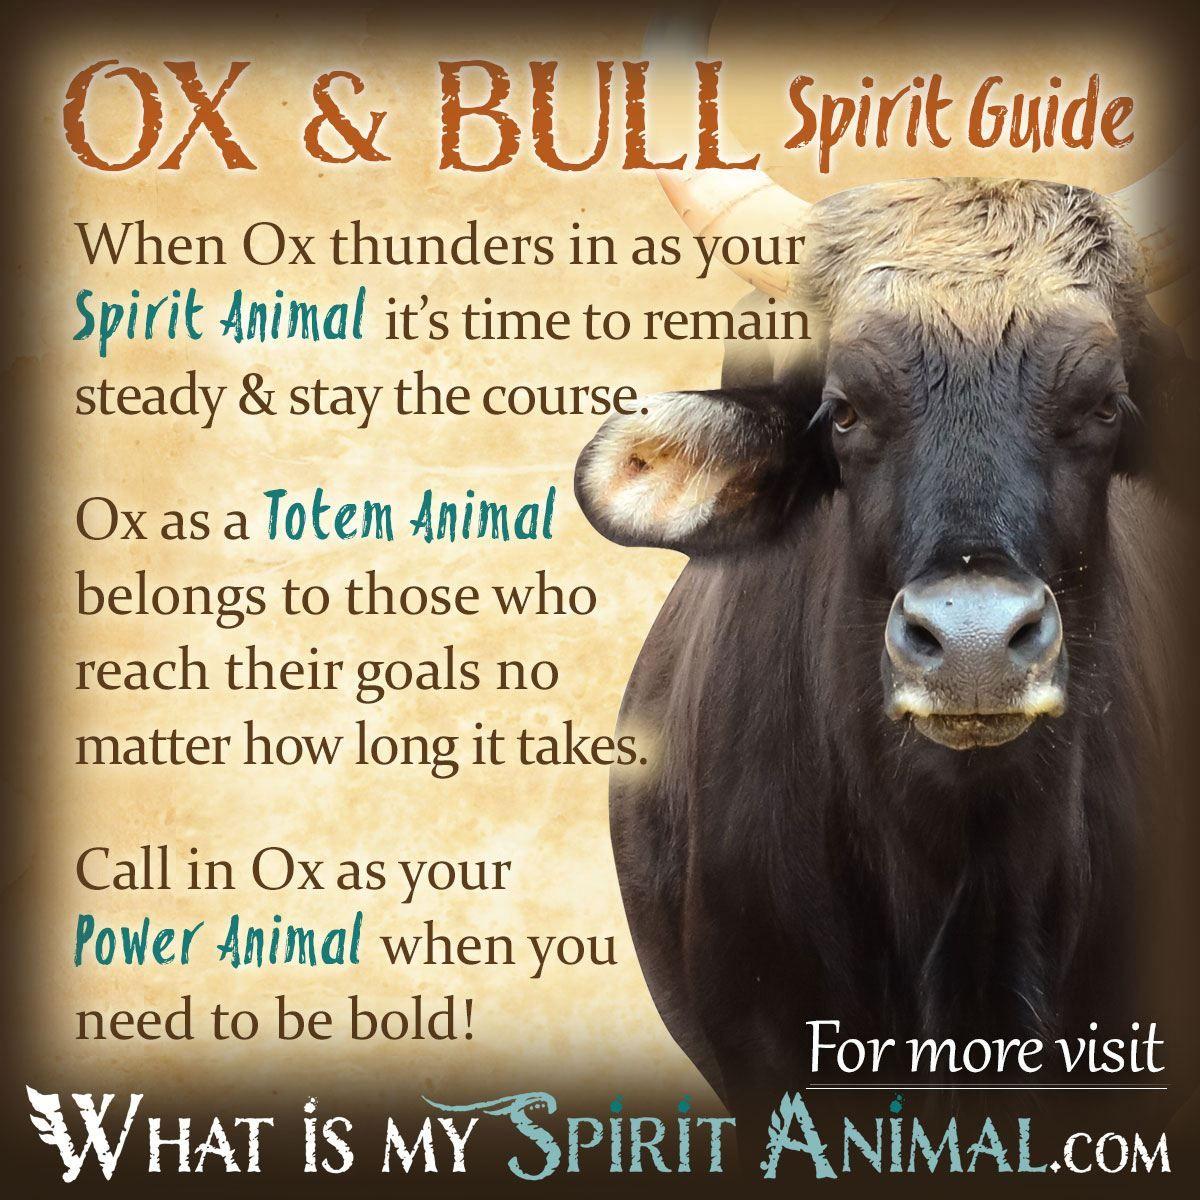 Mammal symbolism meaning power animal american symbols and totems mammal symbolism meaning biocorpaavc